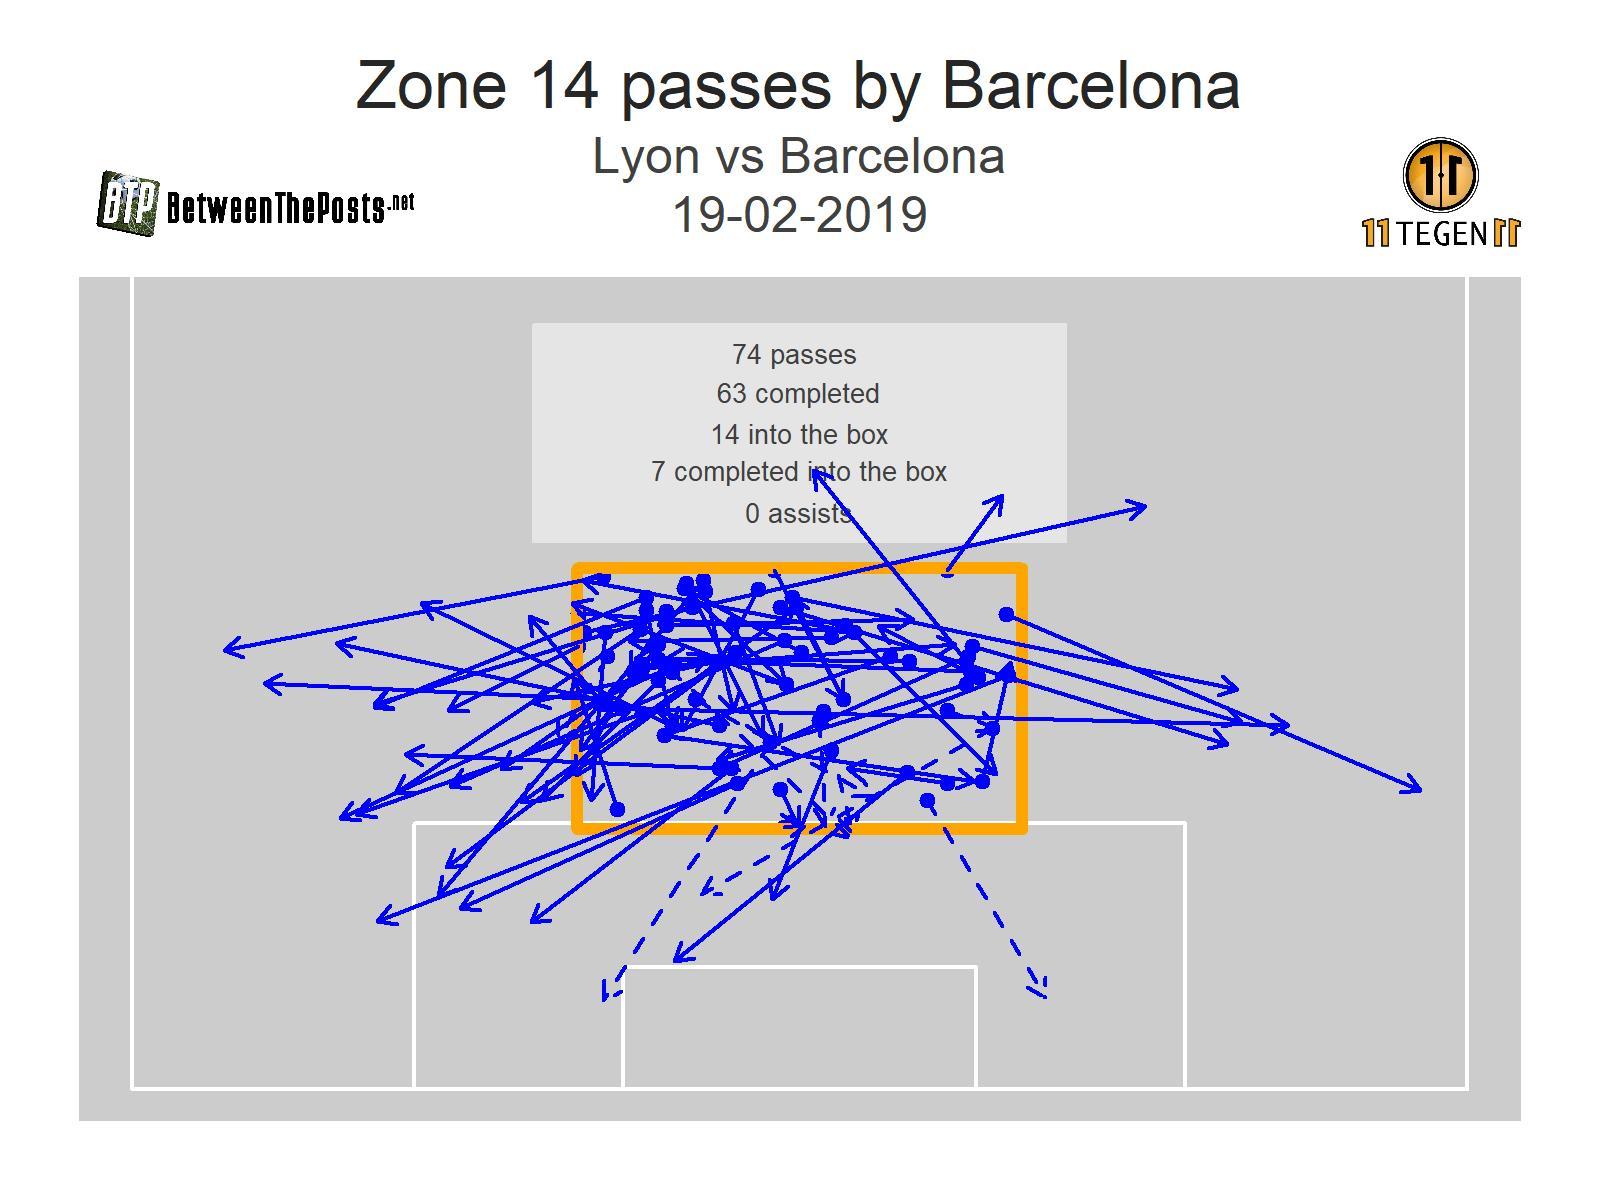 Zone 14 passmap Olympique Lyonnais - Barcelona 0-0 Champions League